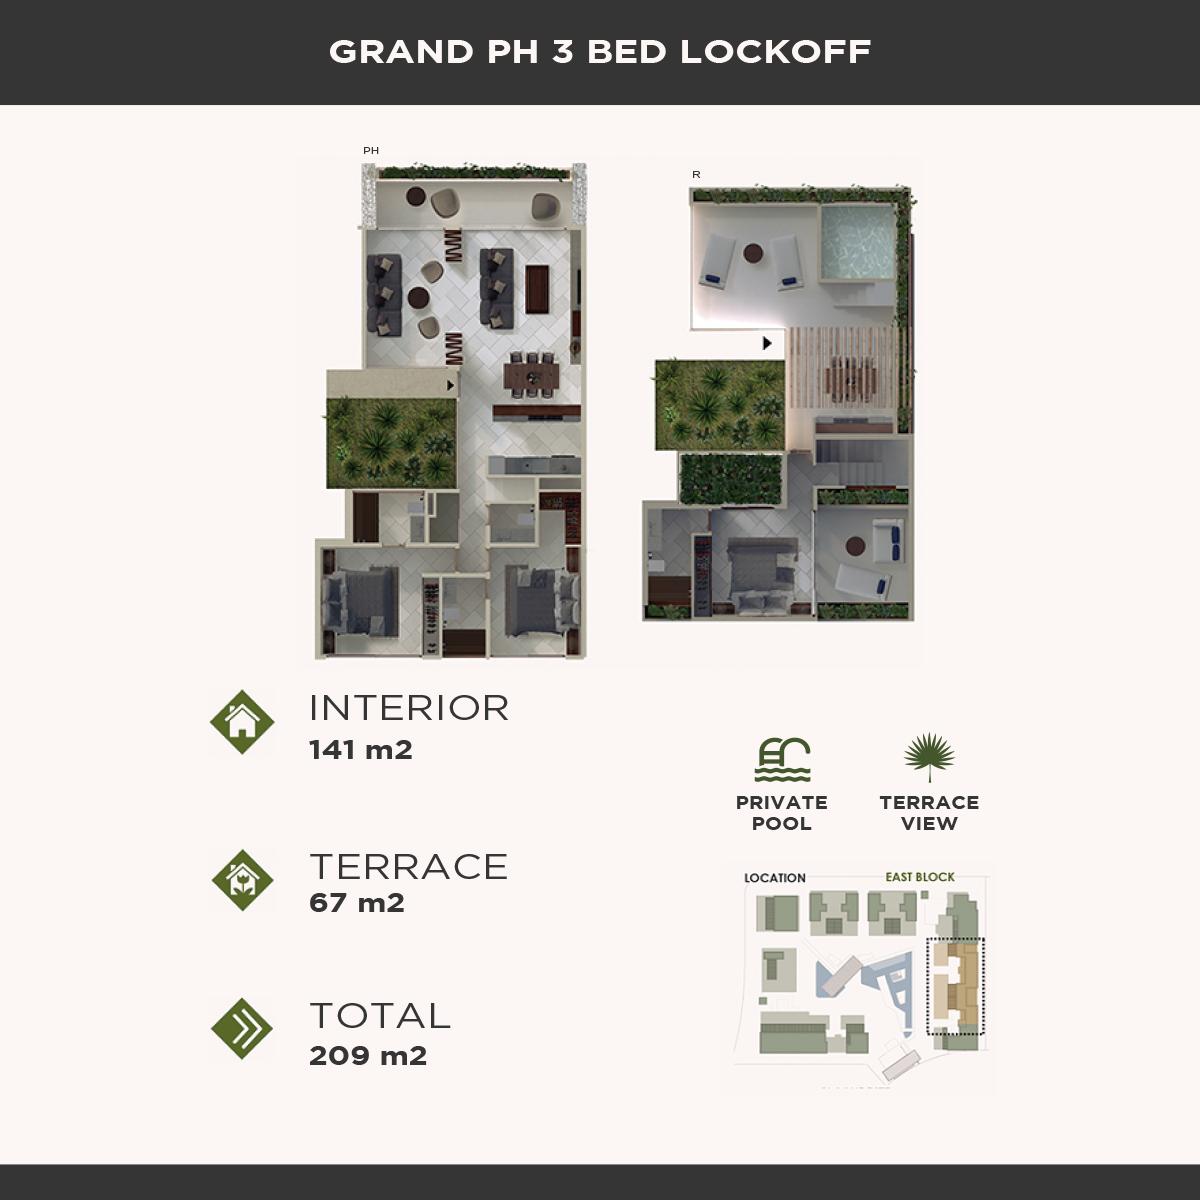 GRAND PH 3 BED LOCKOFF.png